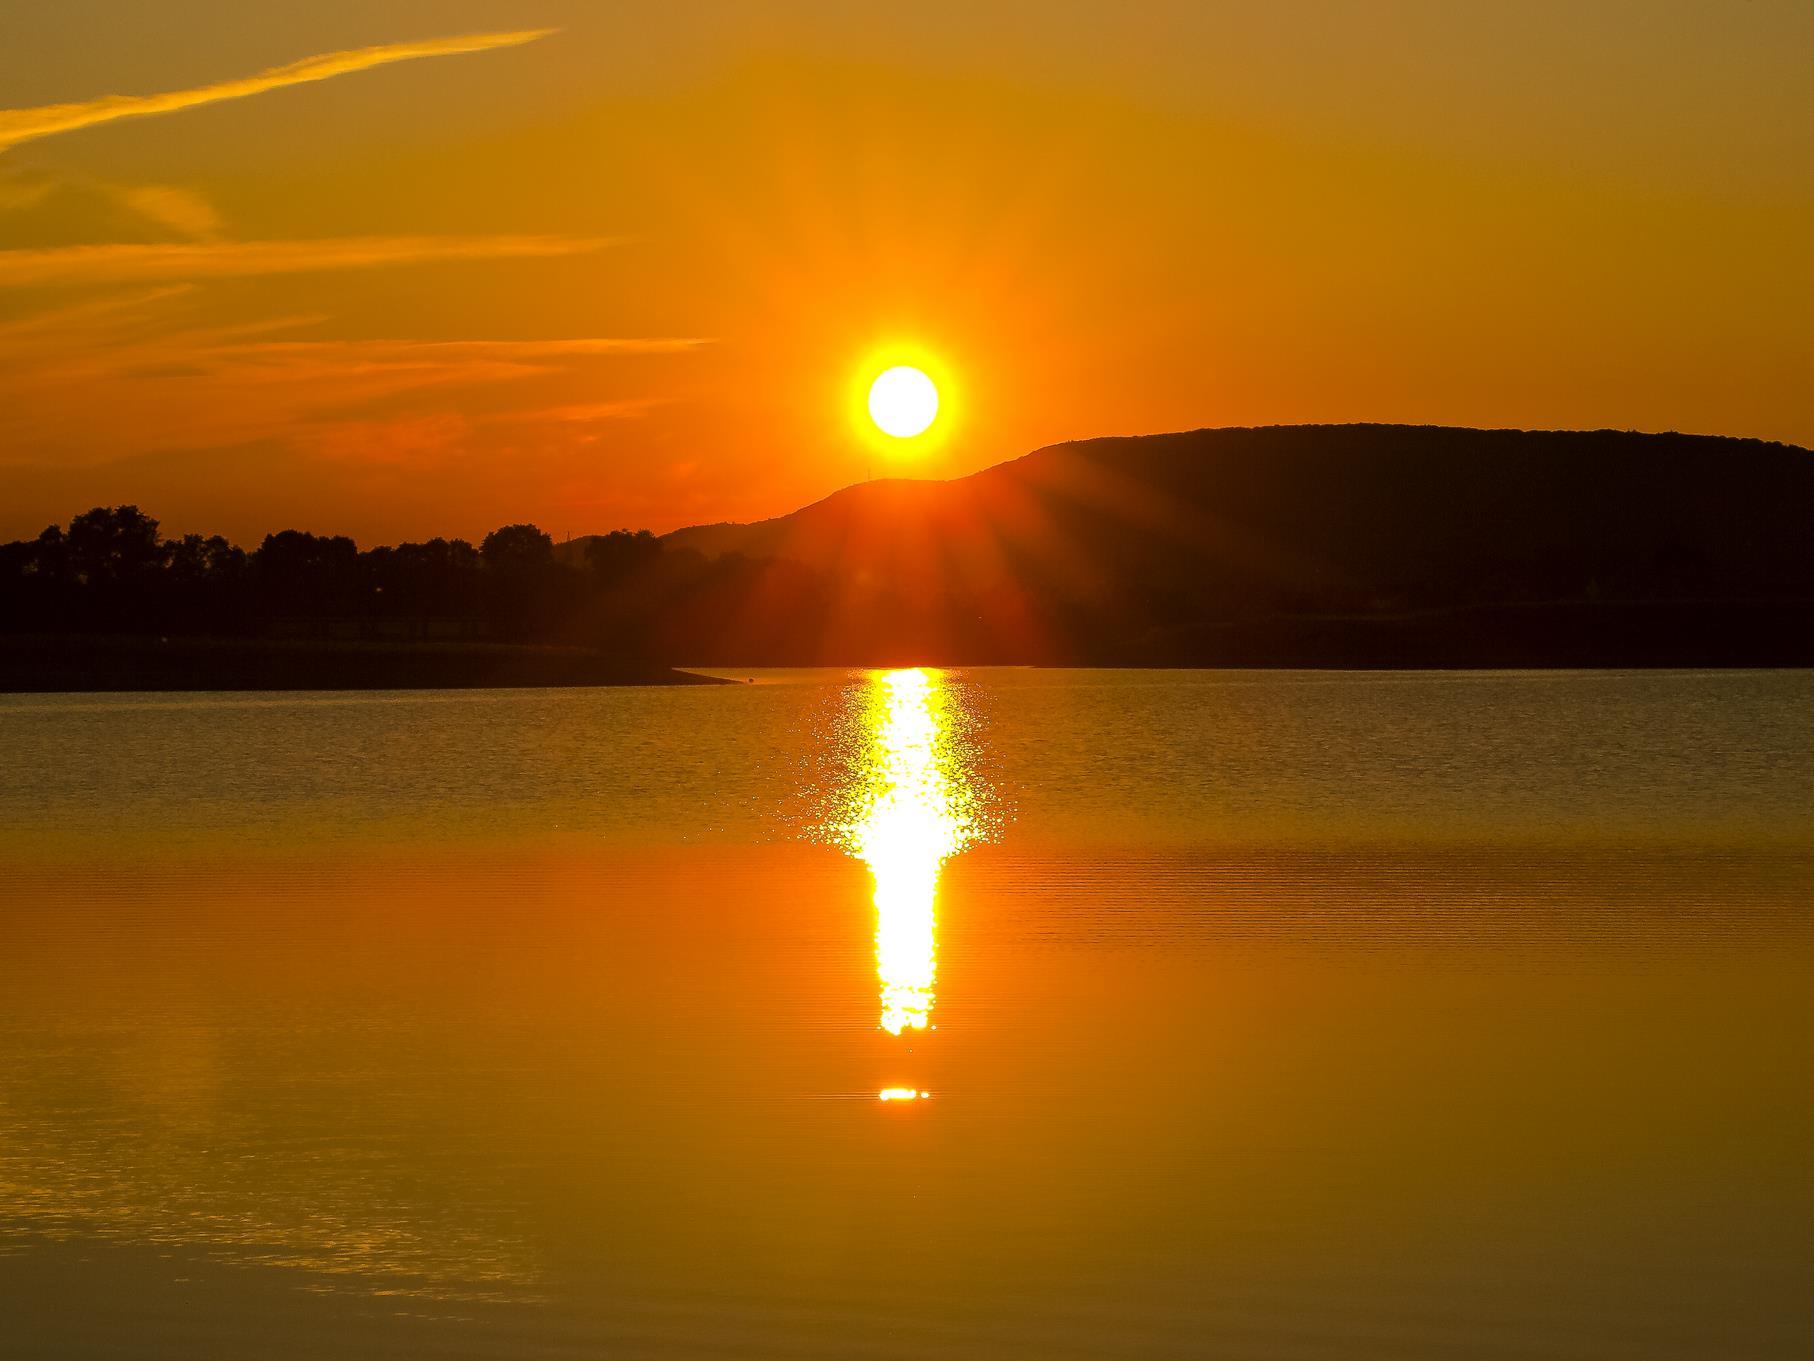 Sonnenuntergang an einem Juni-Abend.